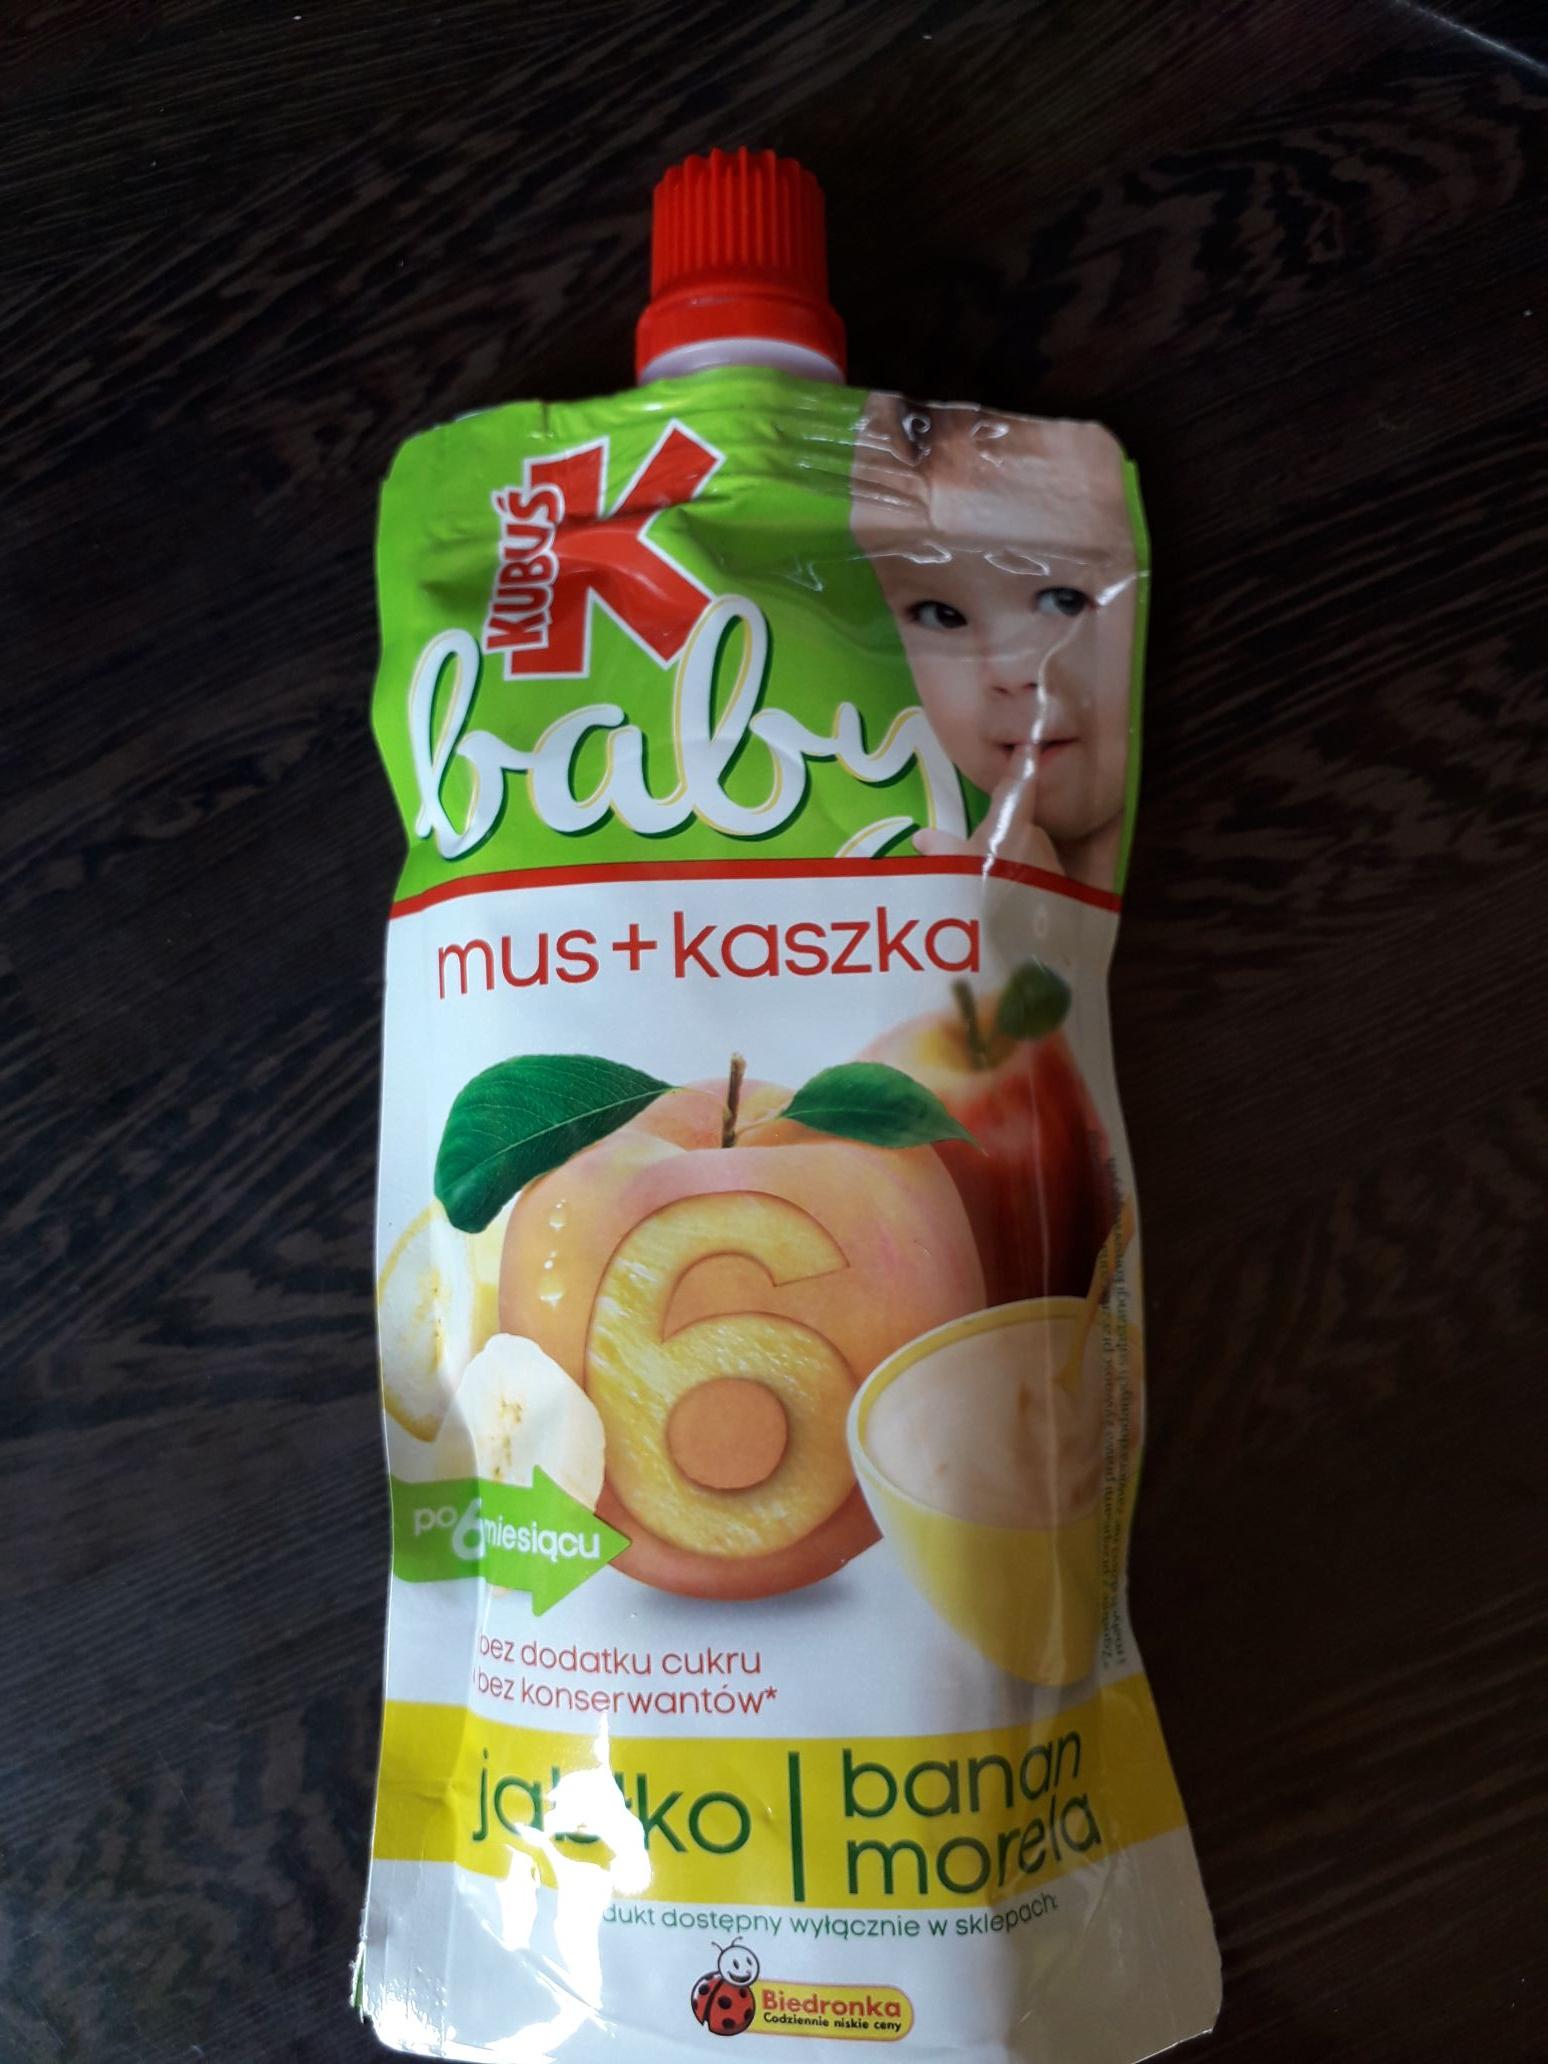 Mus + kaszka Kubuś (jabłko, banan, morela) @ Biedronka